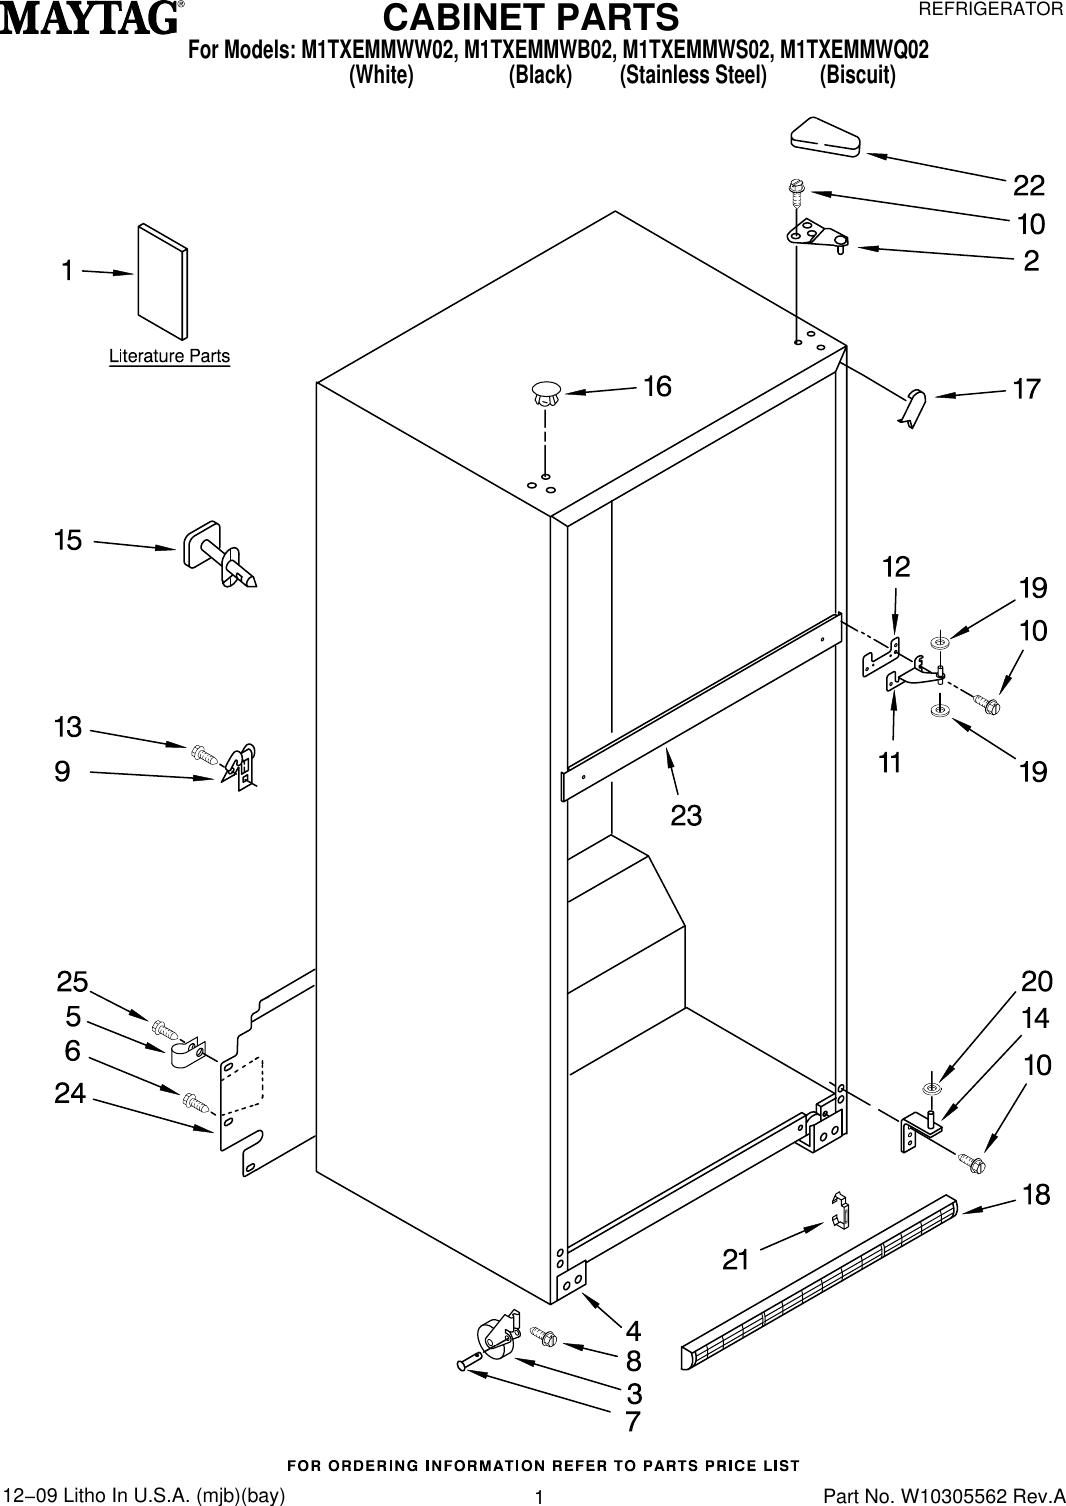 Maytag M1Txemmwb02 Users Manual